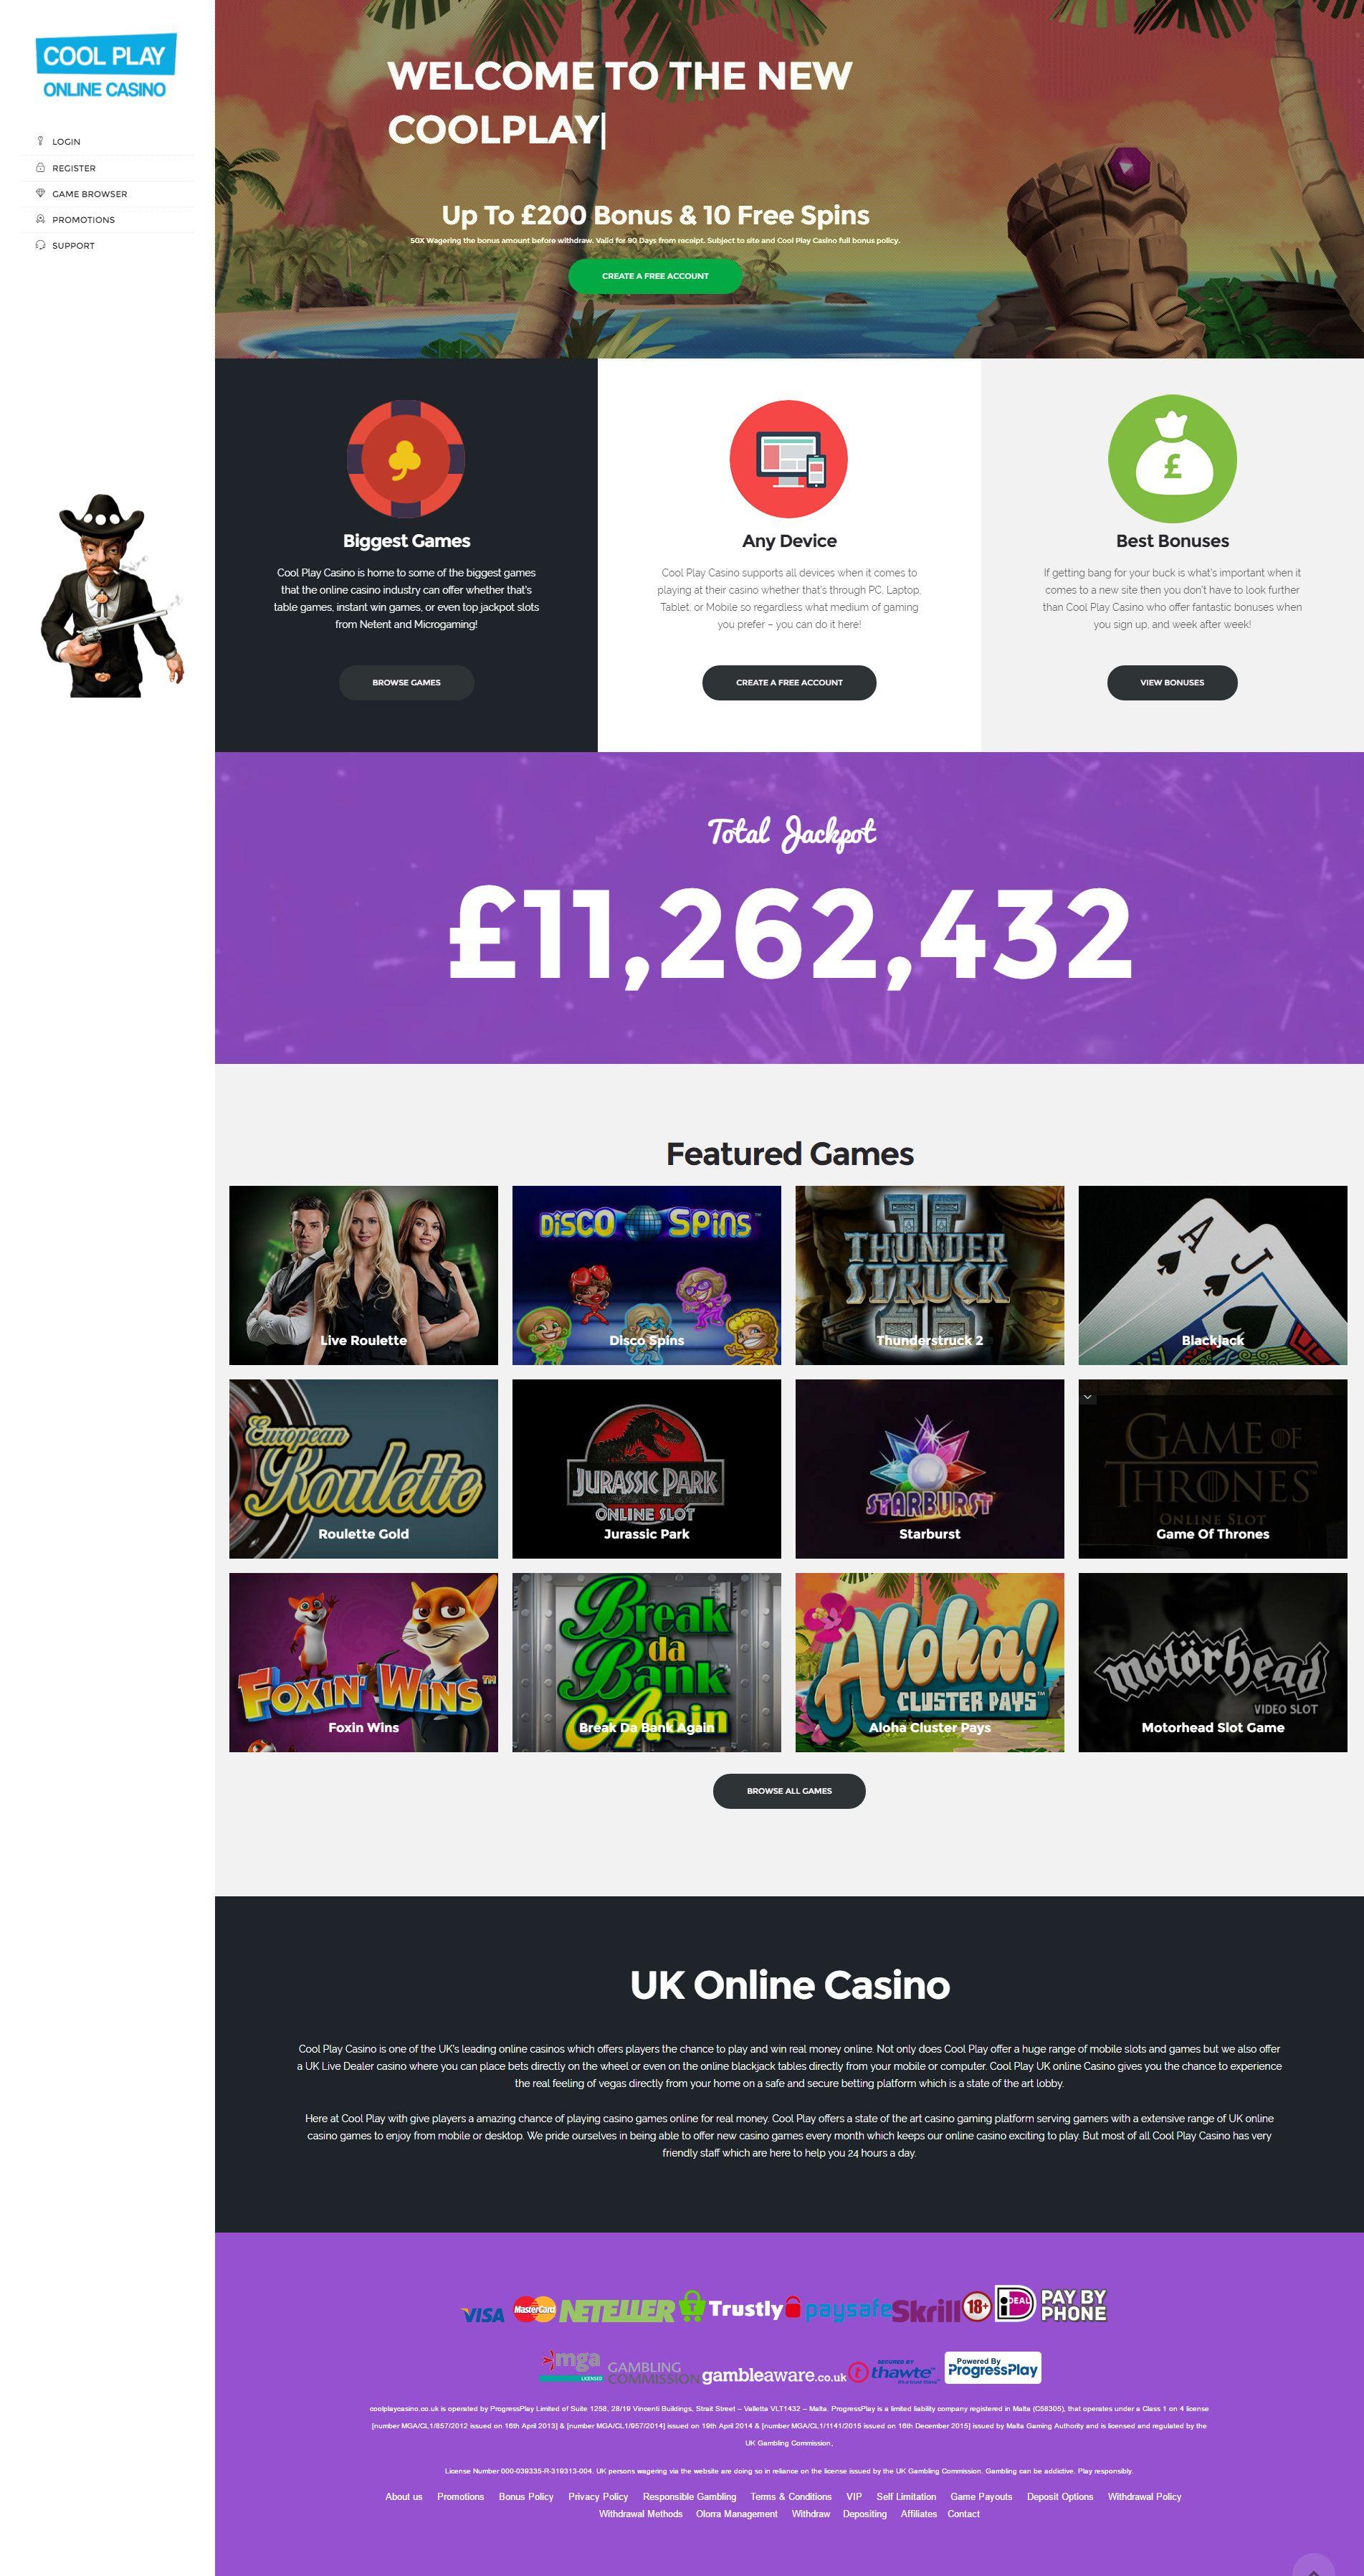 Cool Play Casino | Best Casino Online | Claim 100% Deposit